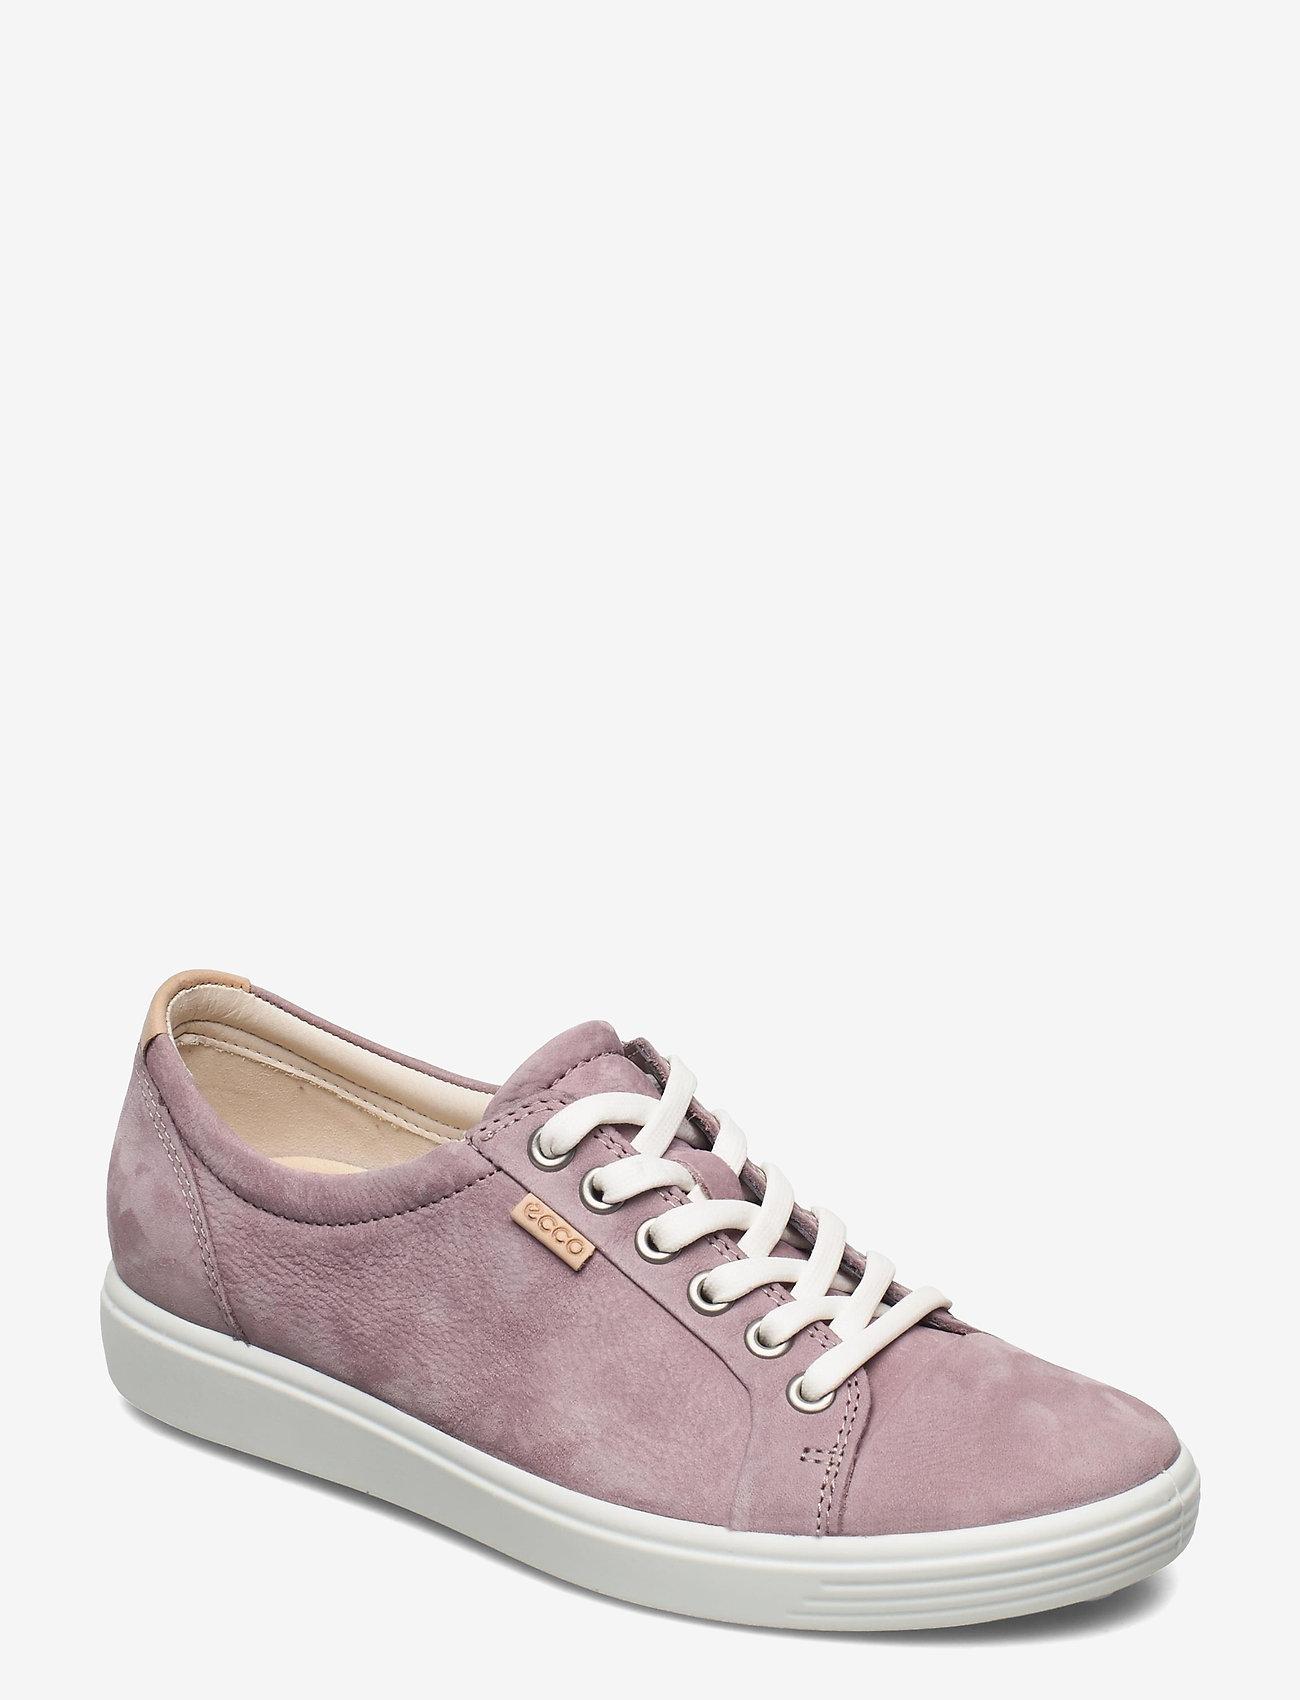 ECCO - SOFT 7 W - låga sneakers - woodrose - 0